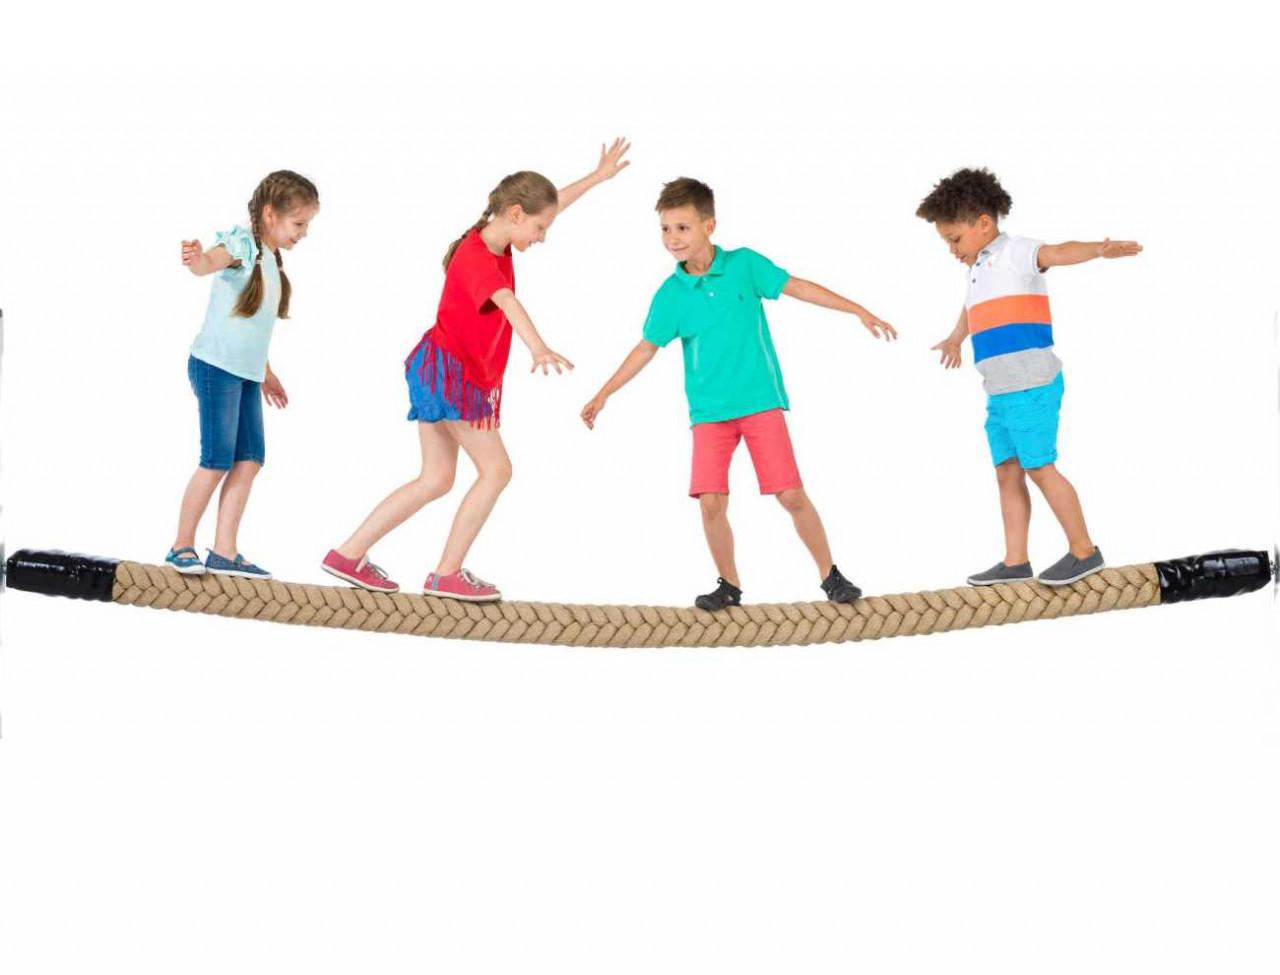 Balancierseil Boa, Spielplatz, Kinder